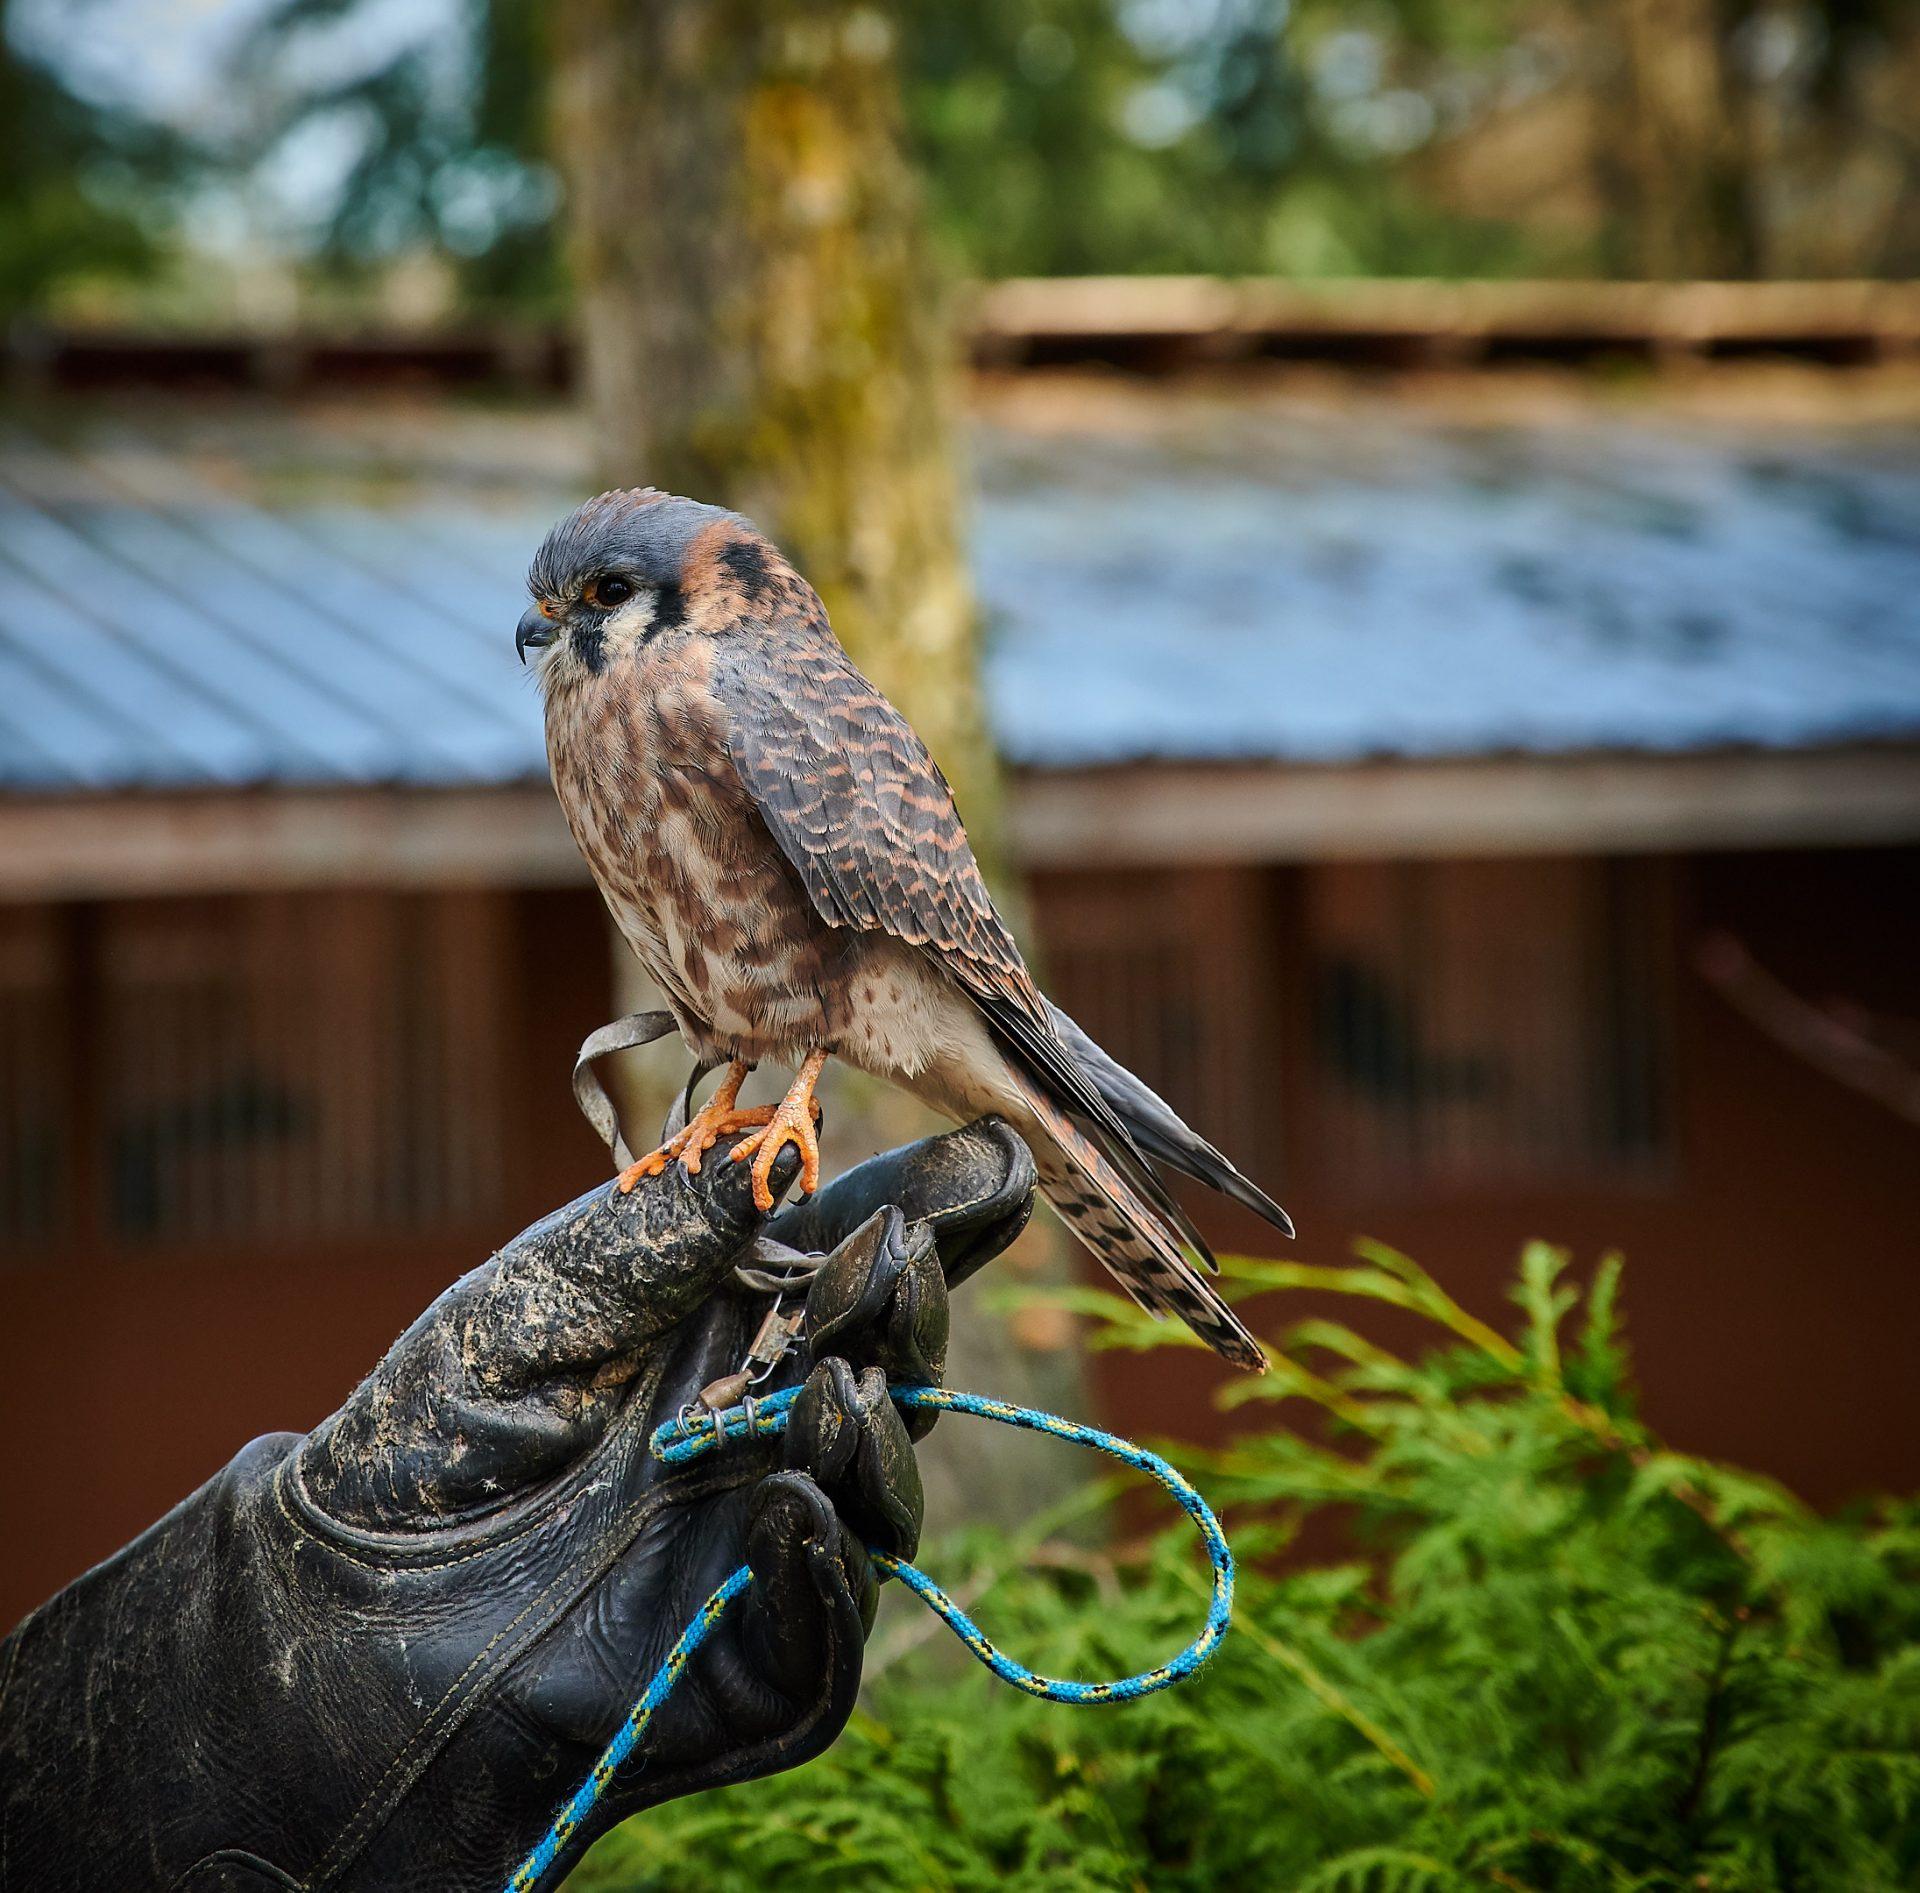 Pacific Northwest Raptors, Duncan, BC – Nikon Z7 Nikkor 24-70 f/4 S – American Kestrel